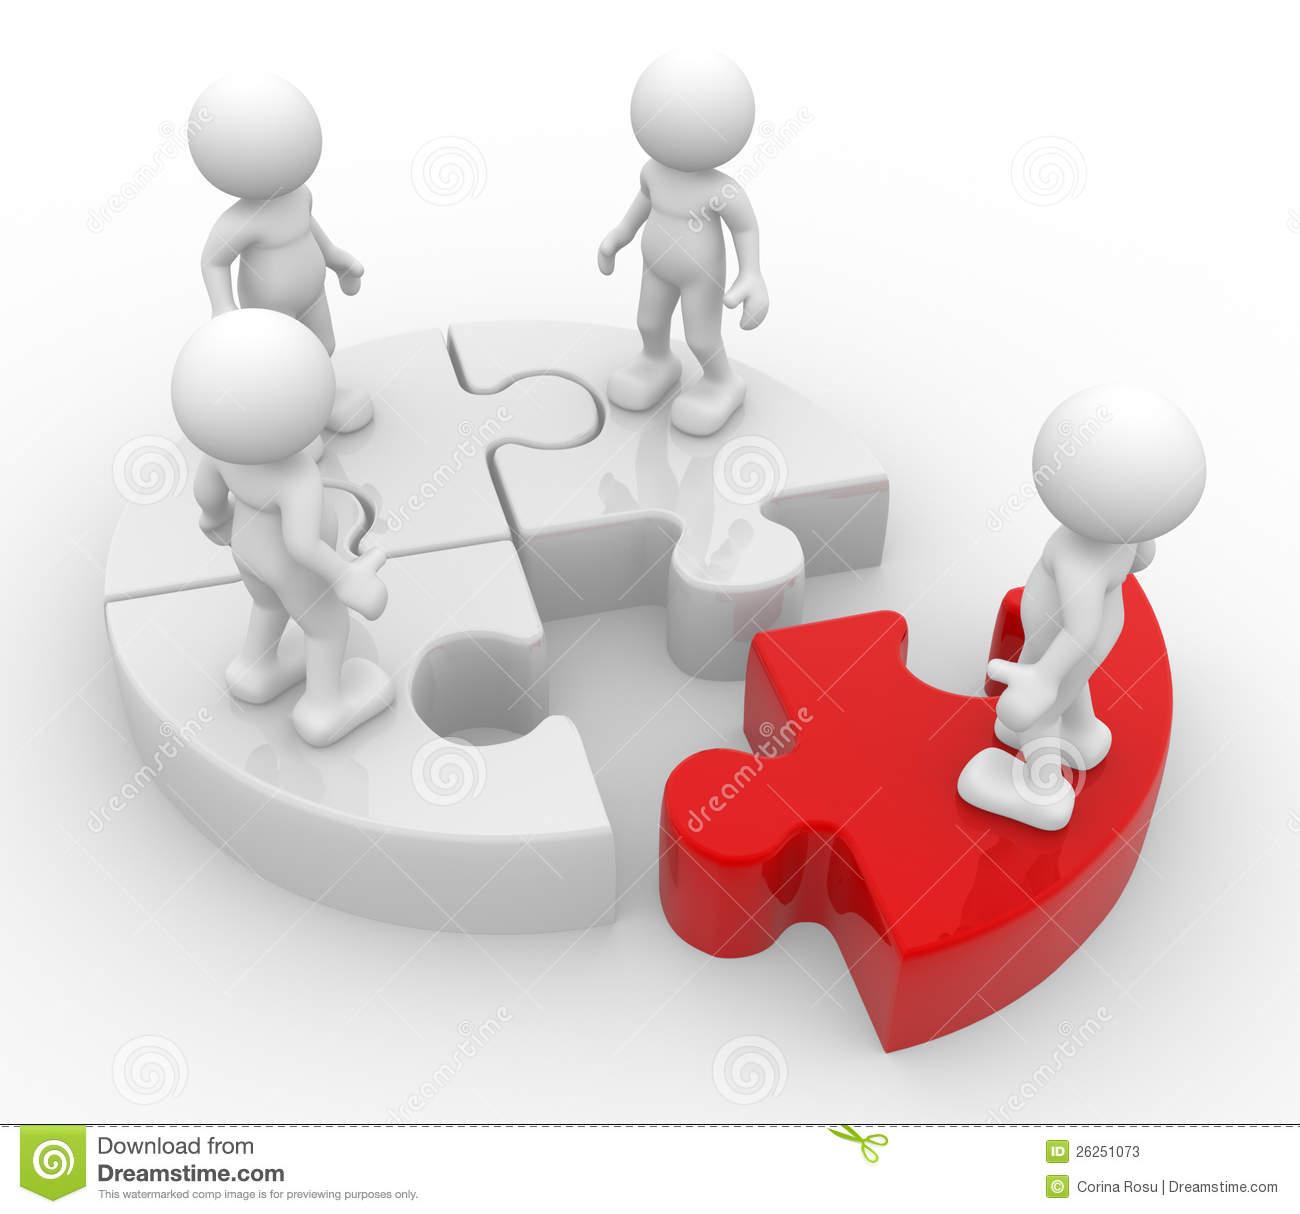 http://images.clipartpanda.com/discrimination-clipart-discrimination-26251073.jpg